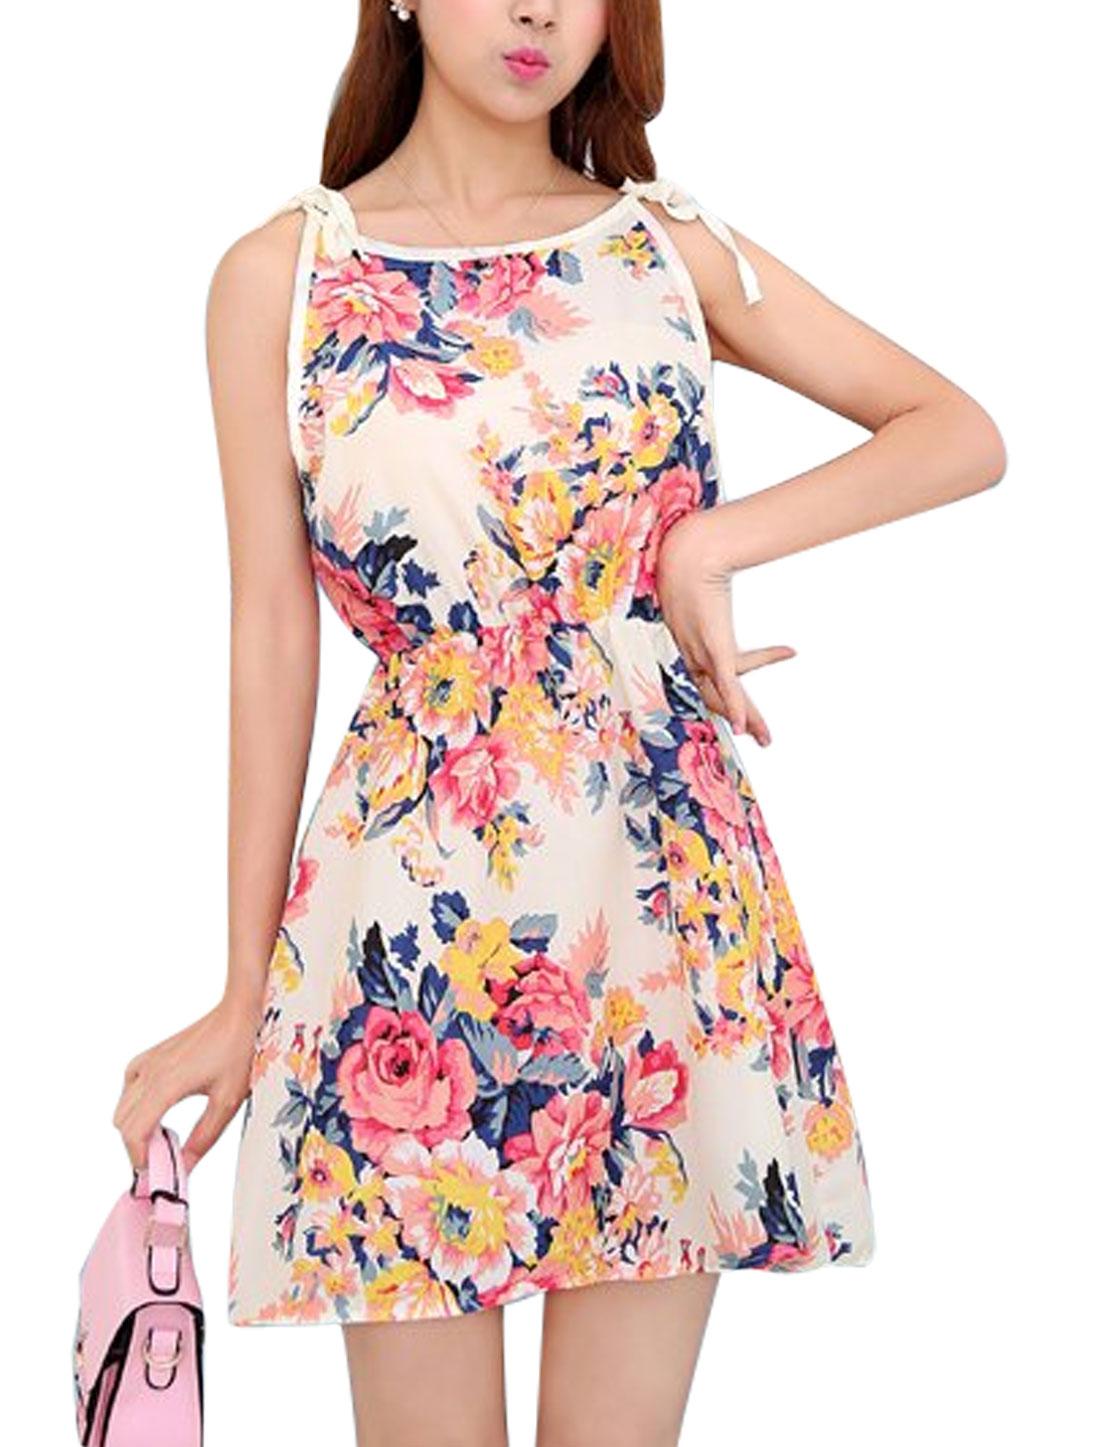 Ladies Round Neck Self Tie Straps Sleeveless Casual Floral Dress Beige XS